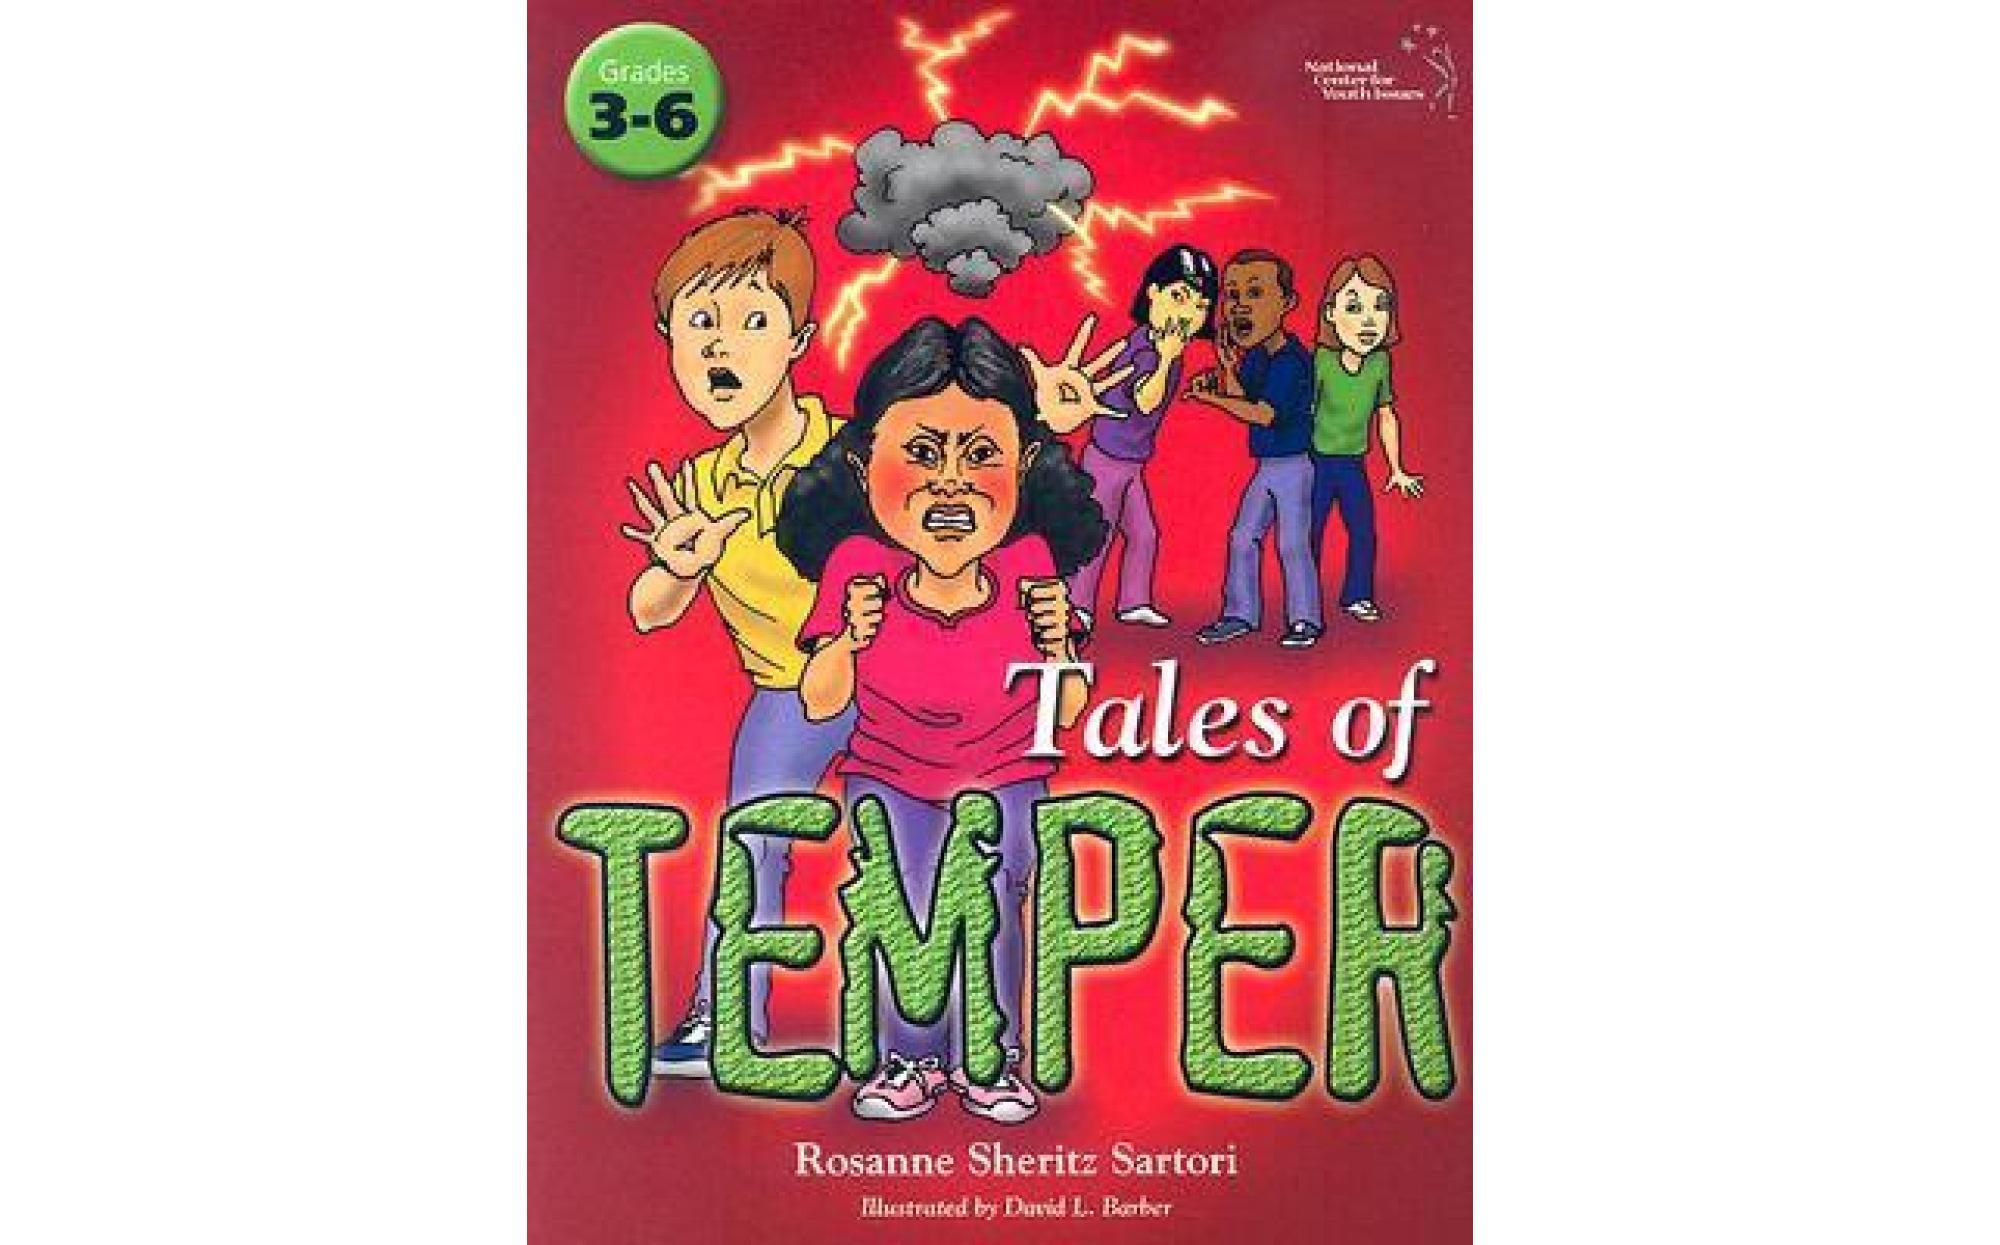 Tales Of Temper Books